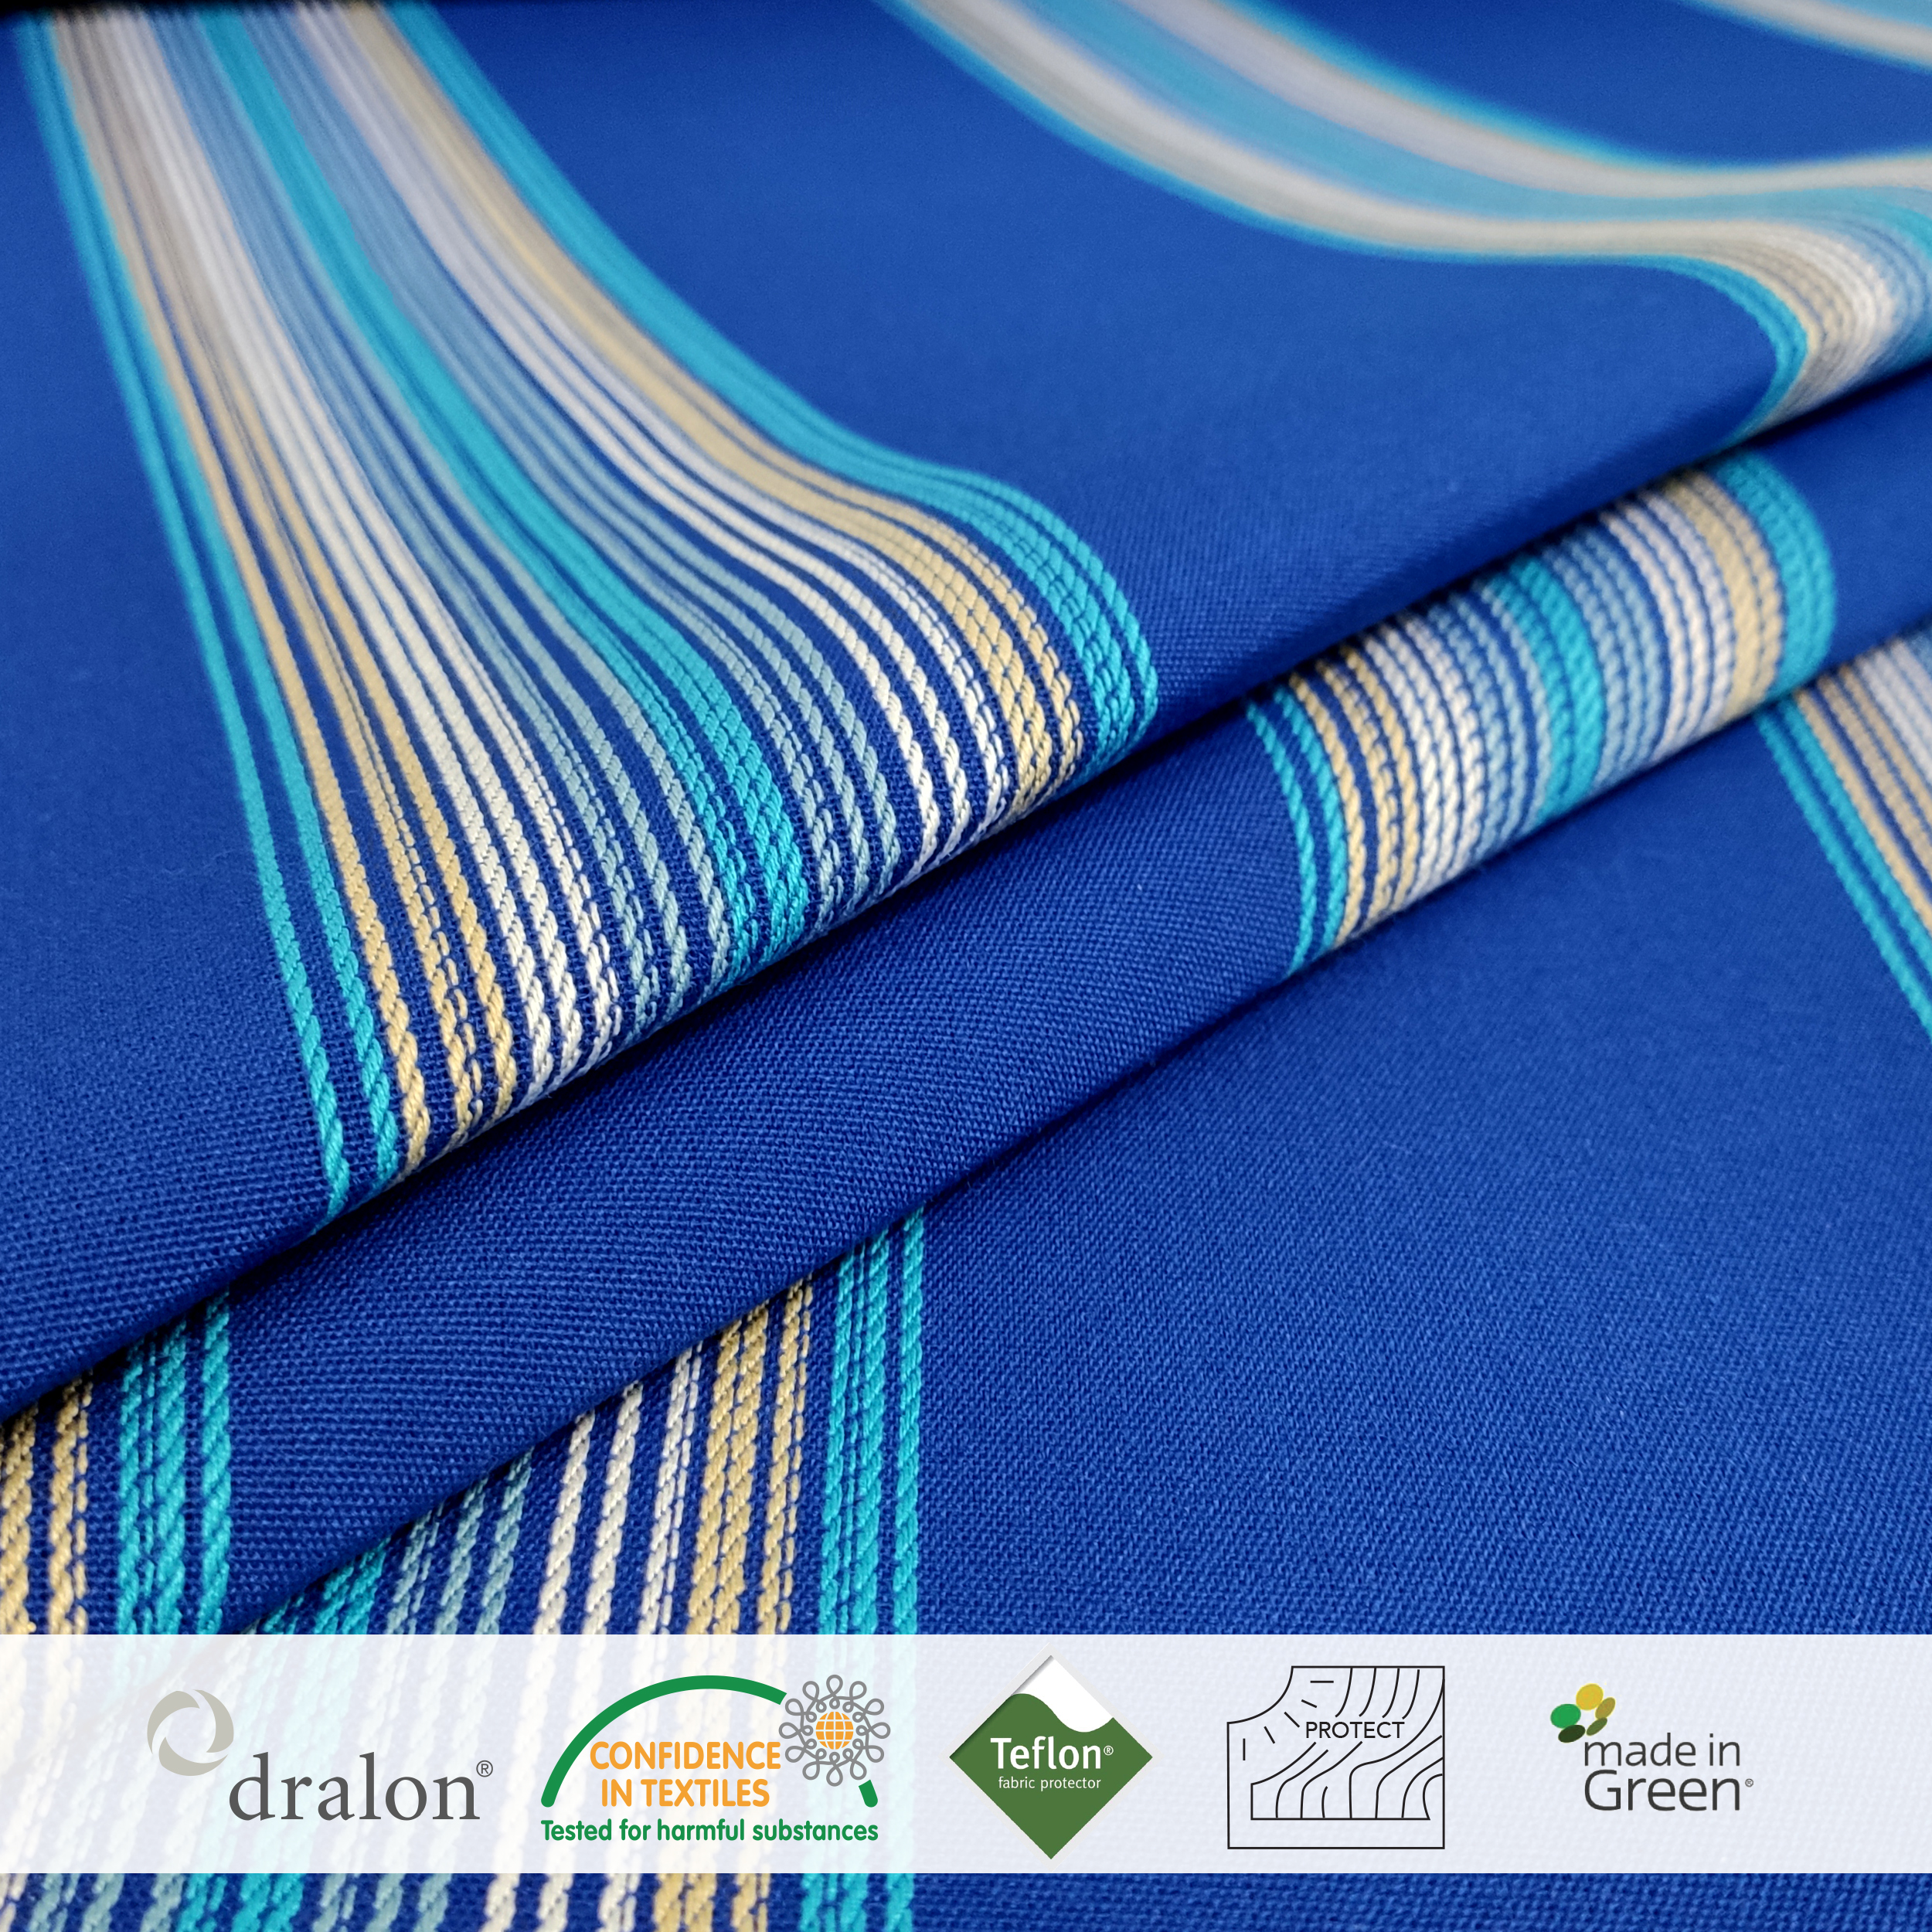 Tessuto da Esterno-Fantasia-Fasce-Rigate-Blu